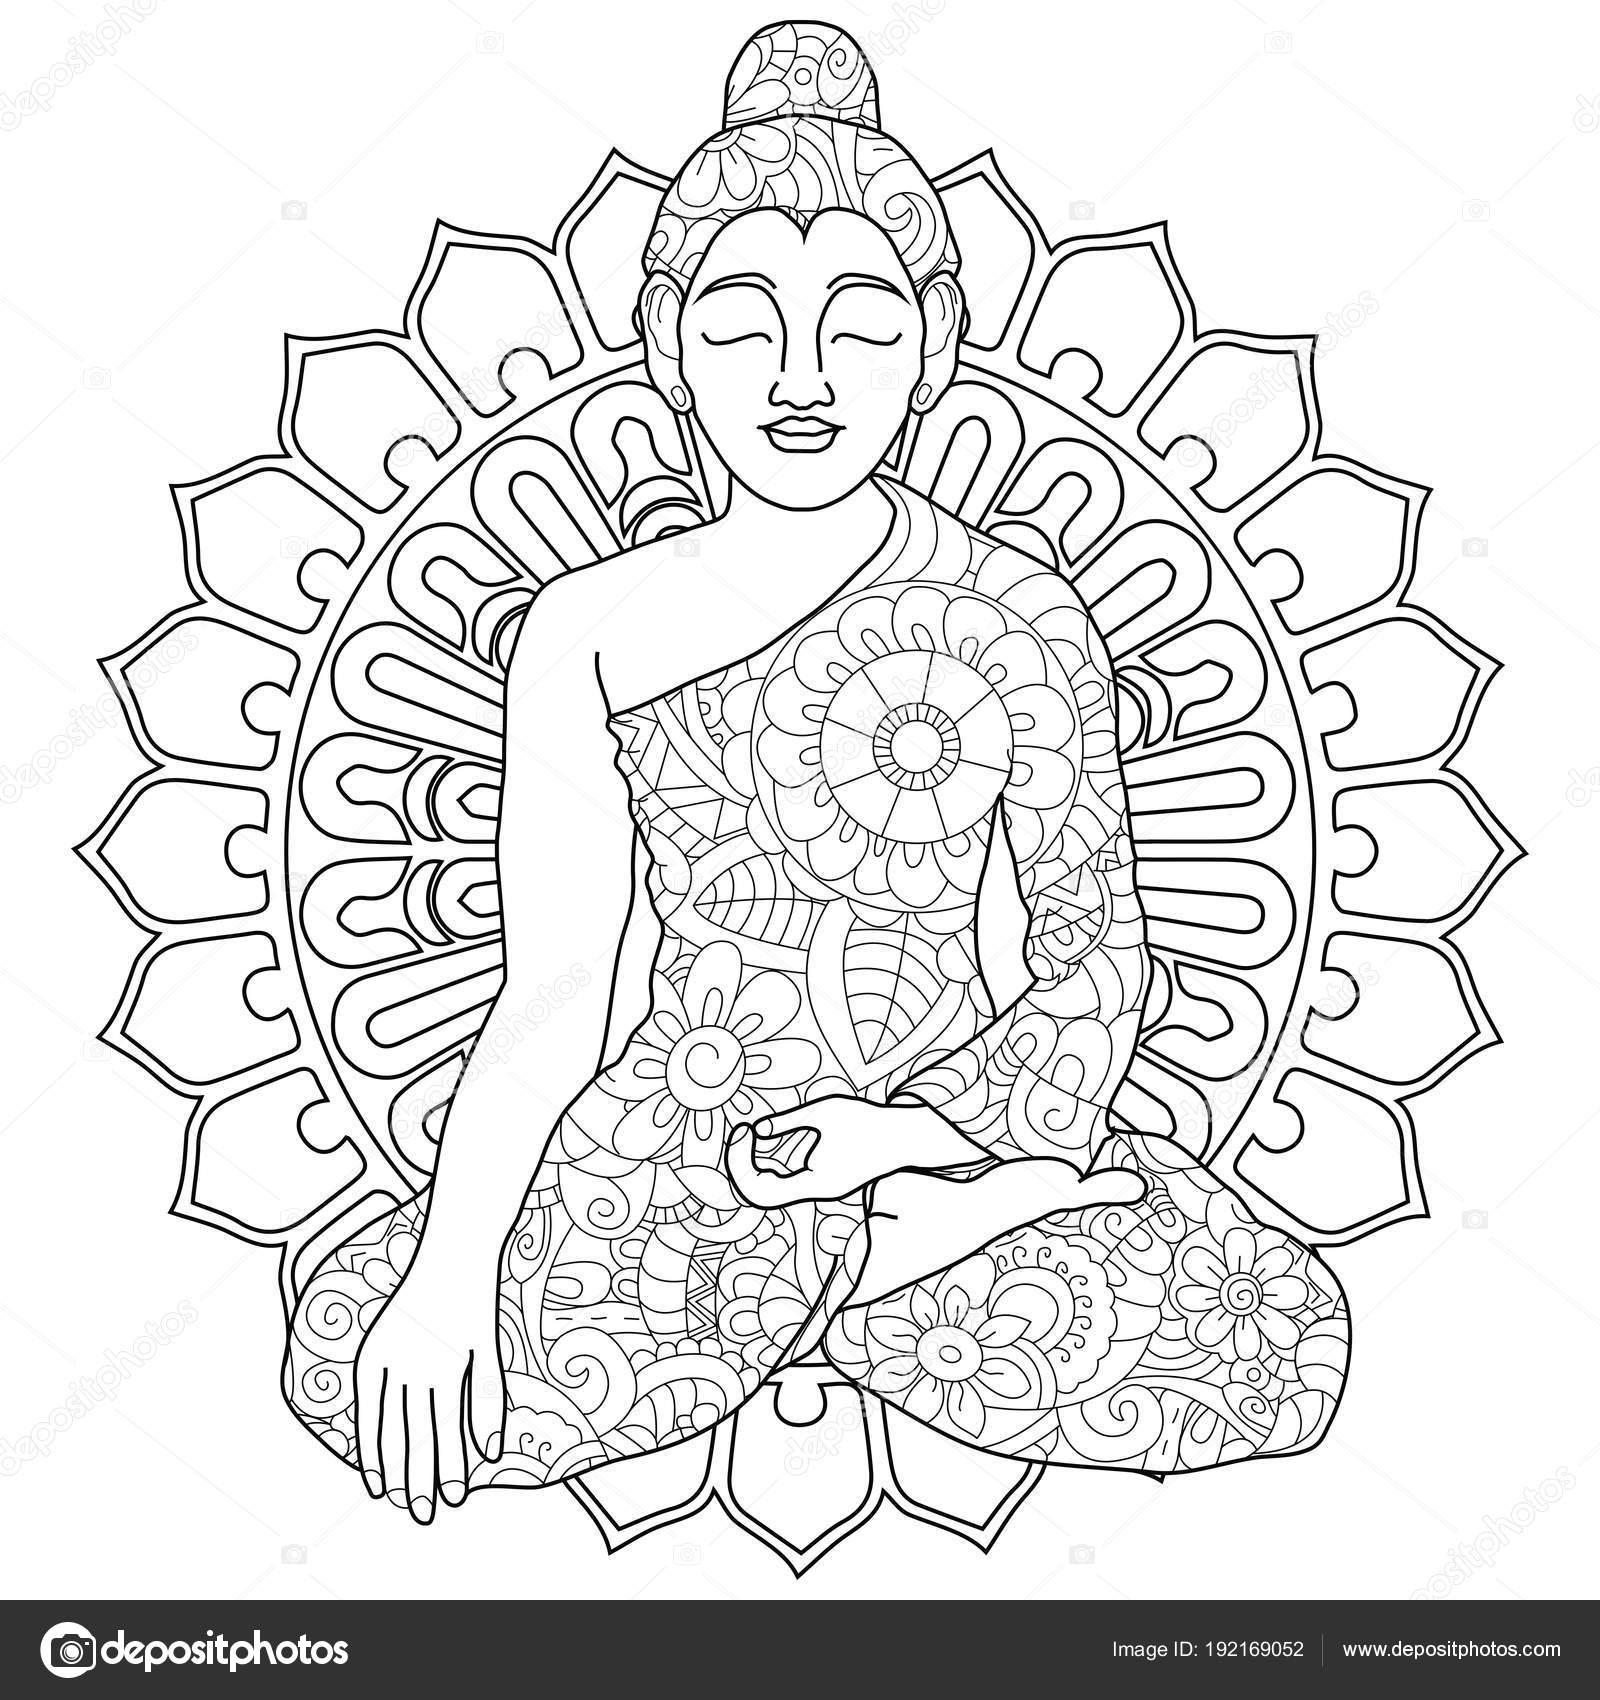 Adult Antistress Coloring Manadala Woman Doing Yoga Pattern Astrakhan Illustration Of Black Lines